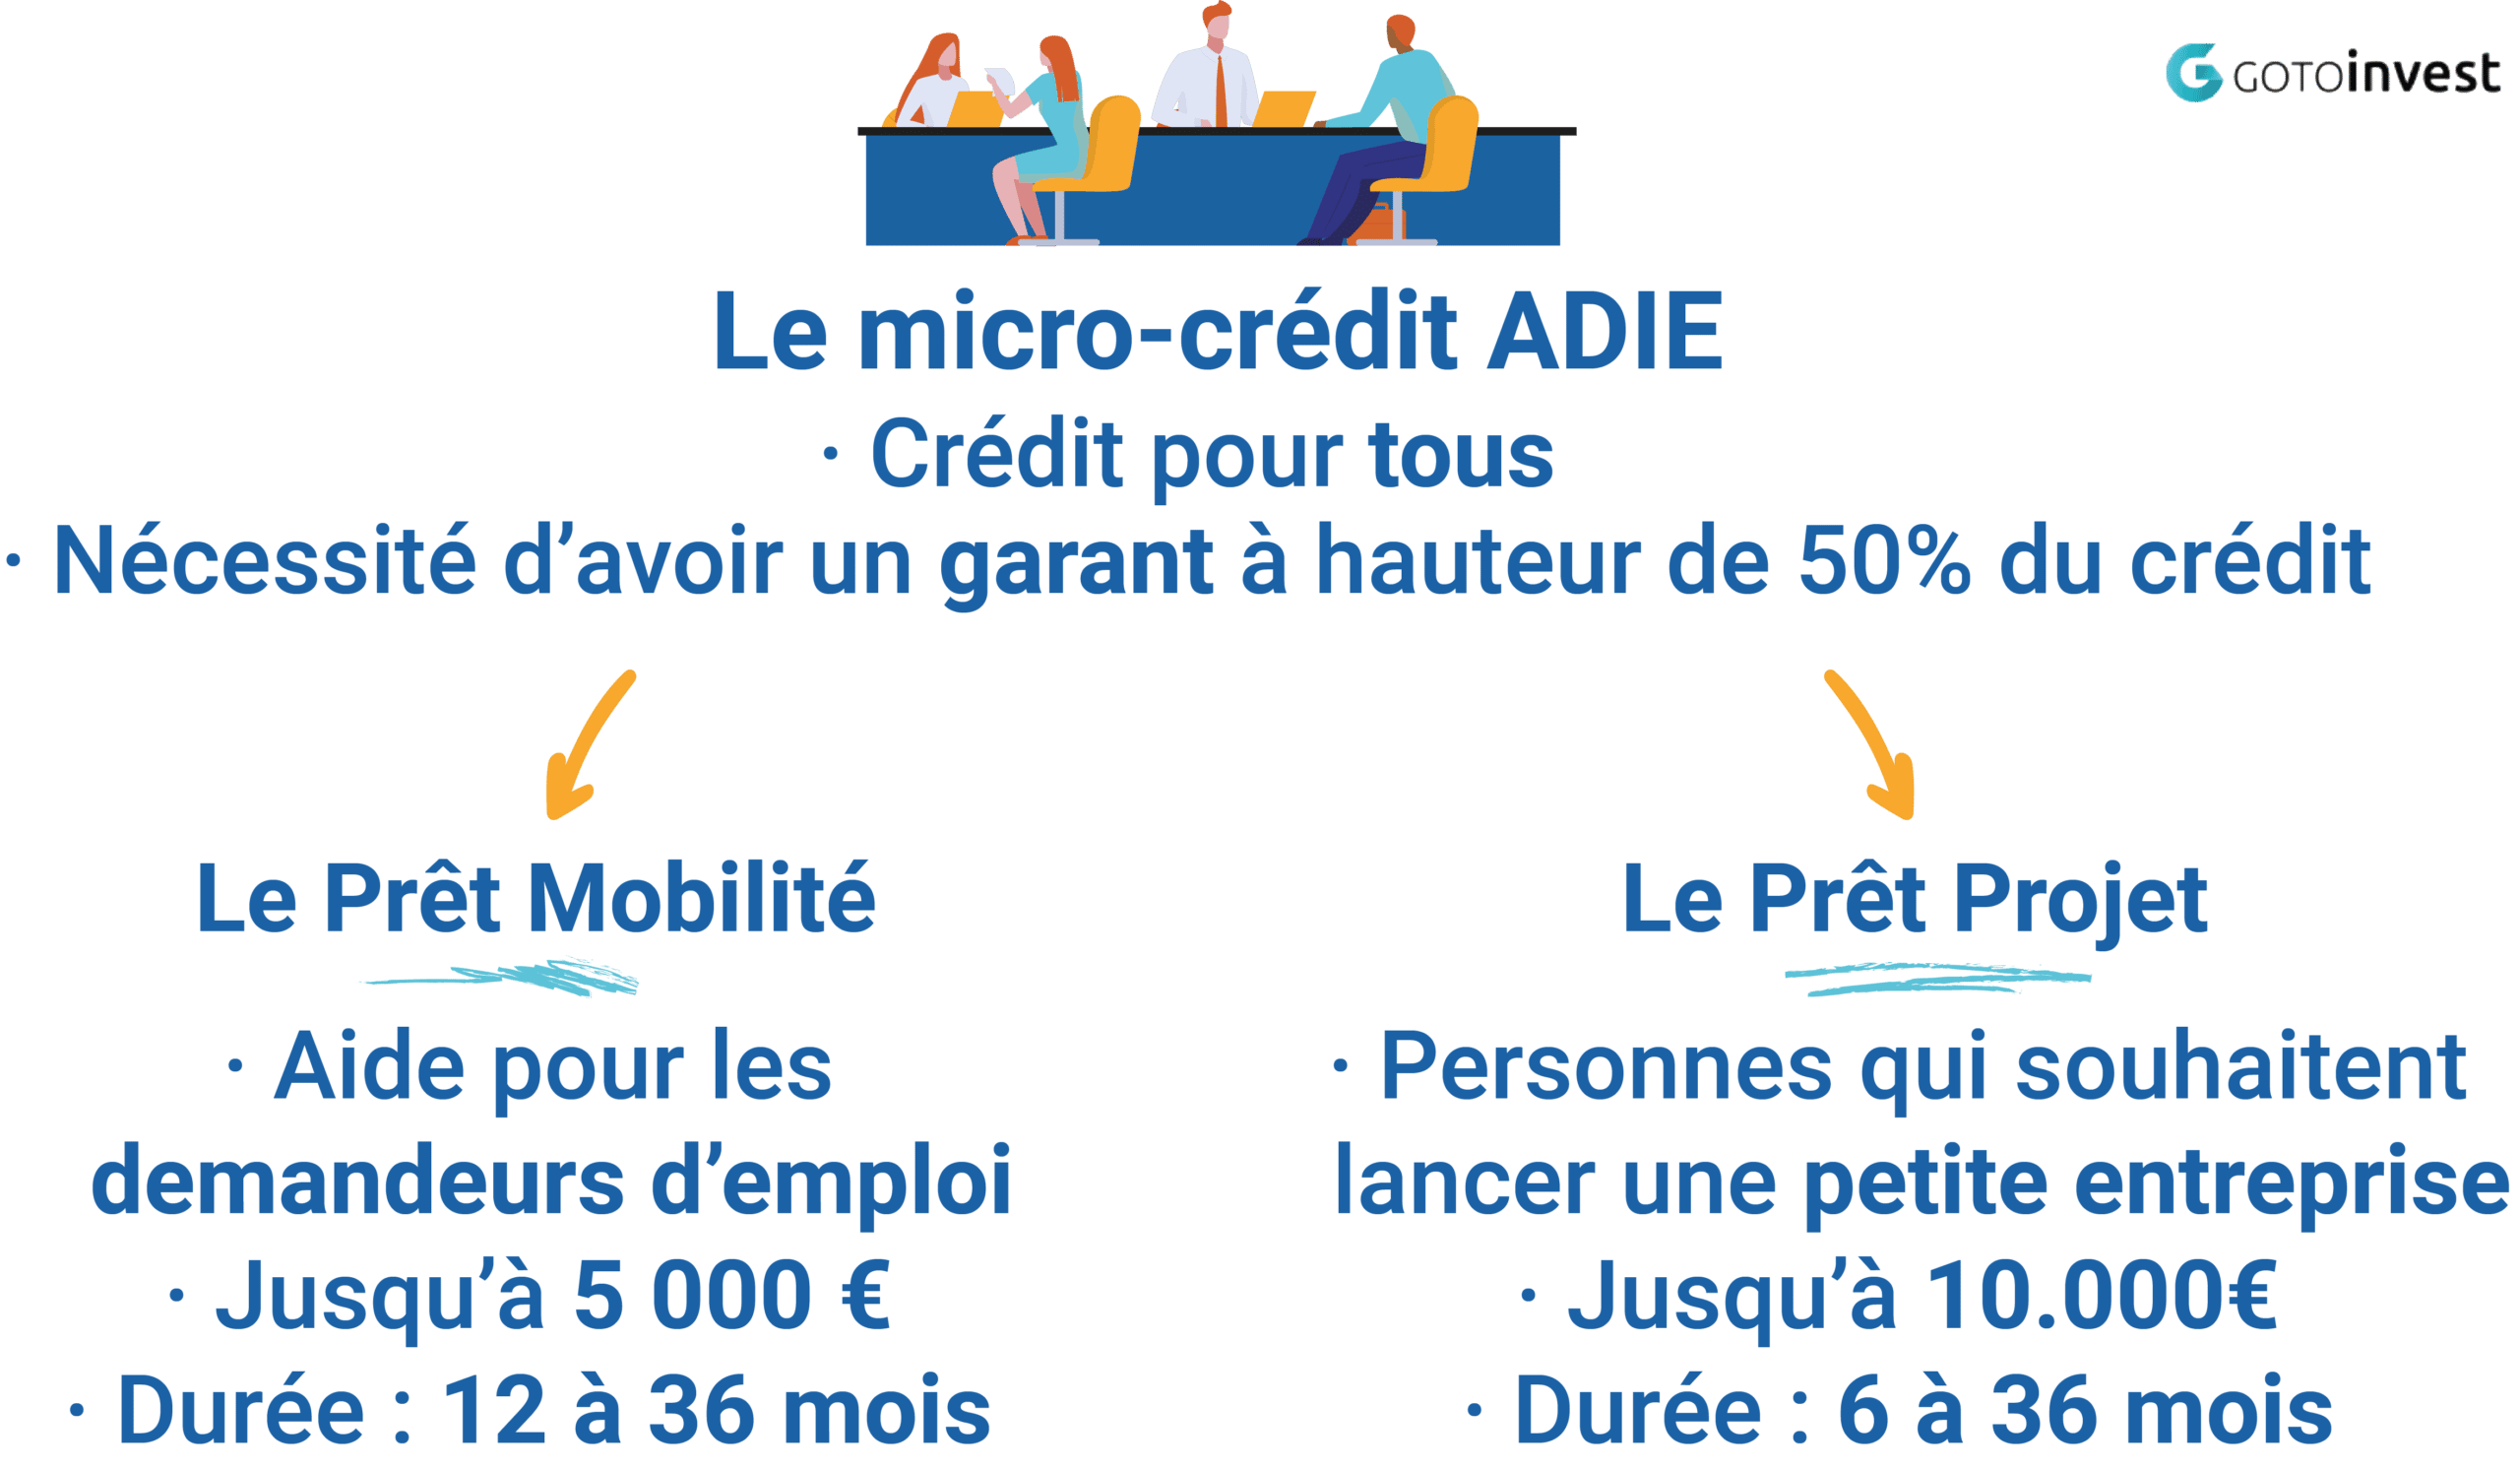 micro credit Adie